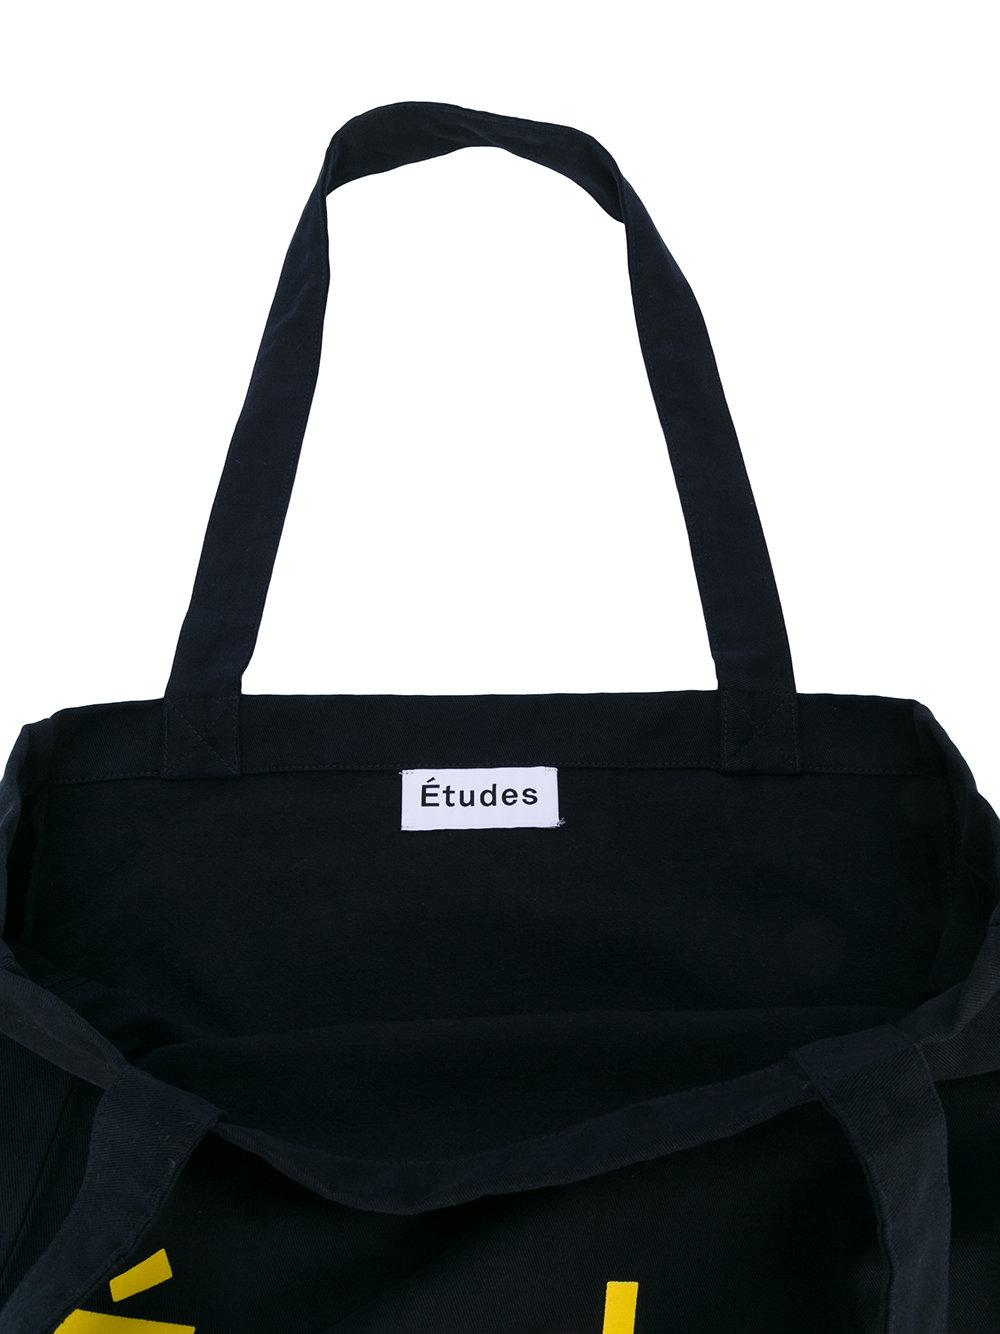 Etudes Studio Cotton Logo Tote Bag in Blue